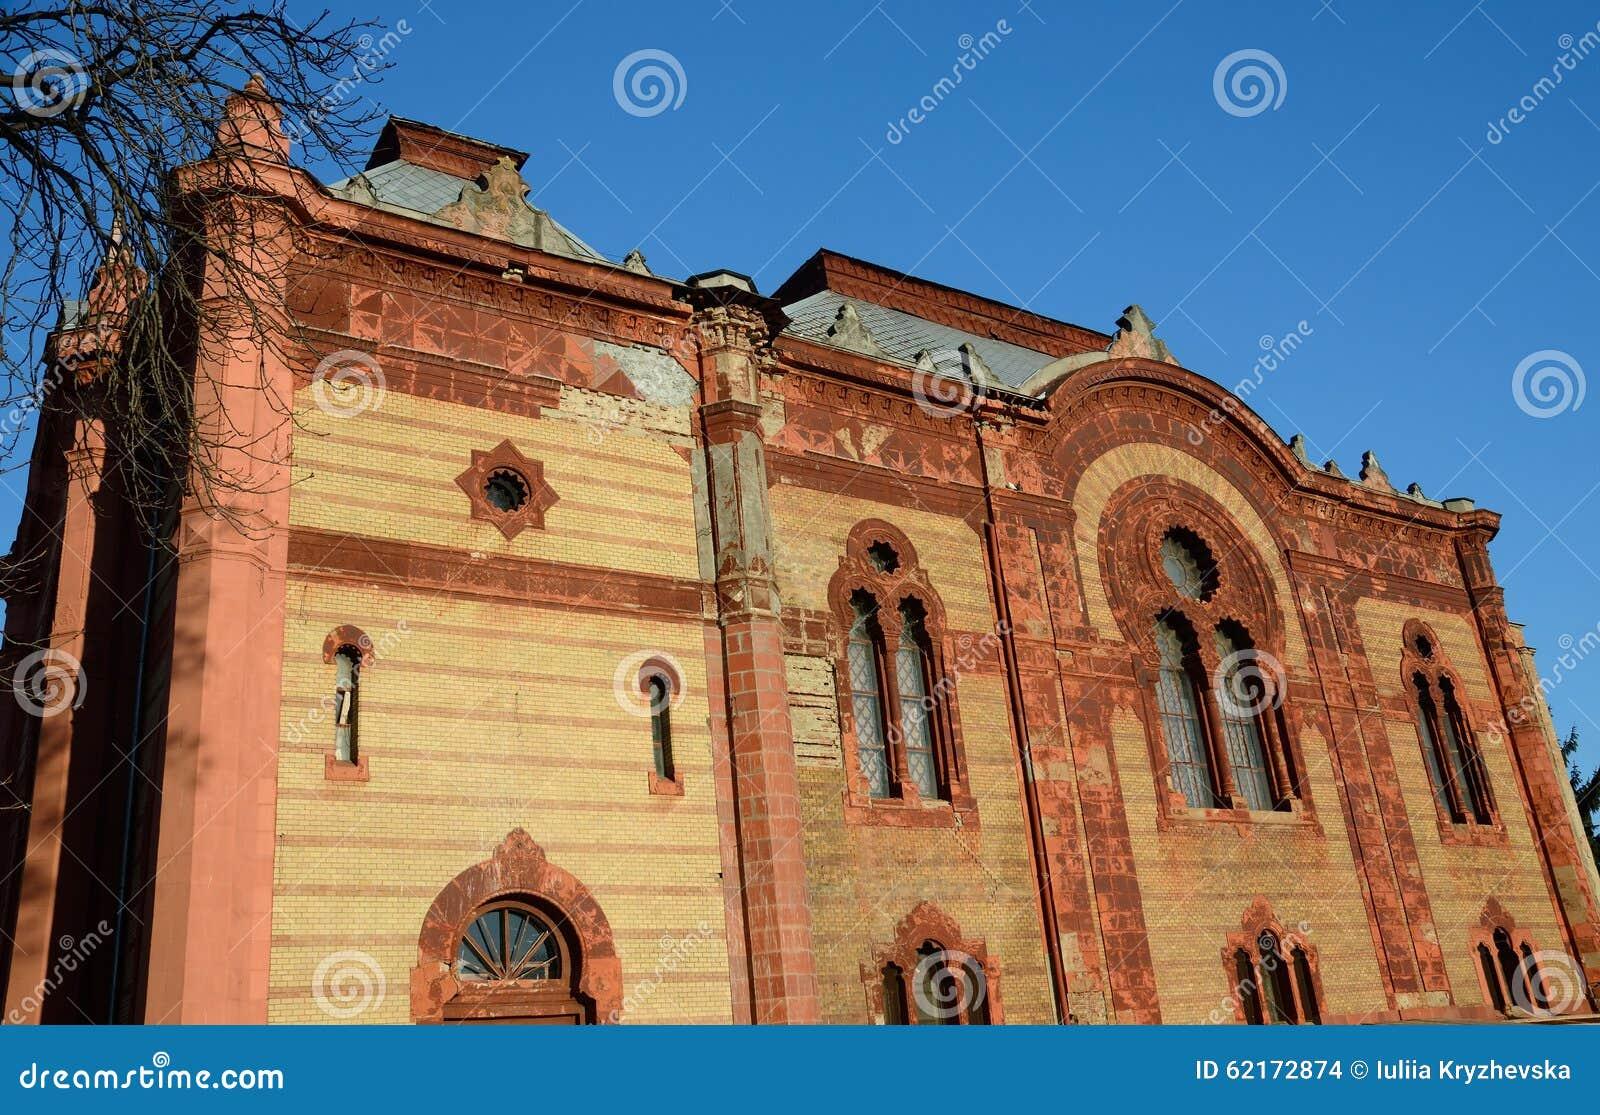 Beautiful Old Jewish Temple Synagogue In Uzhgorod